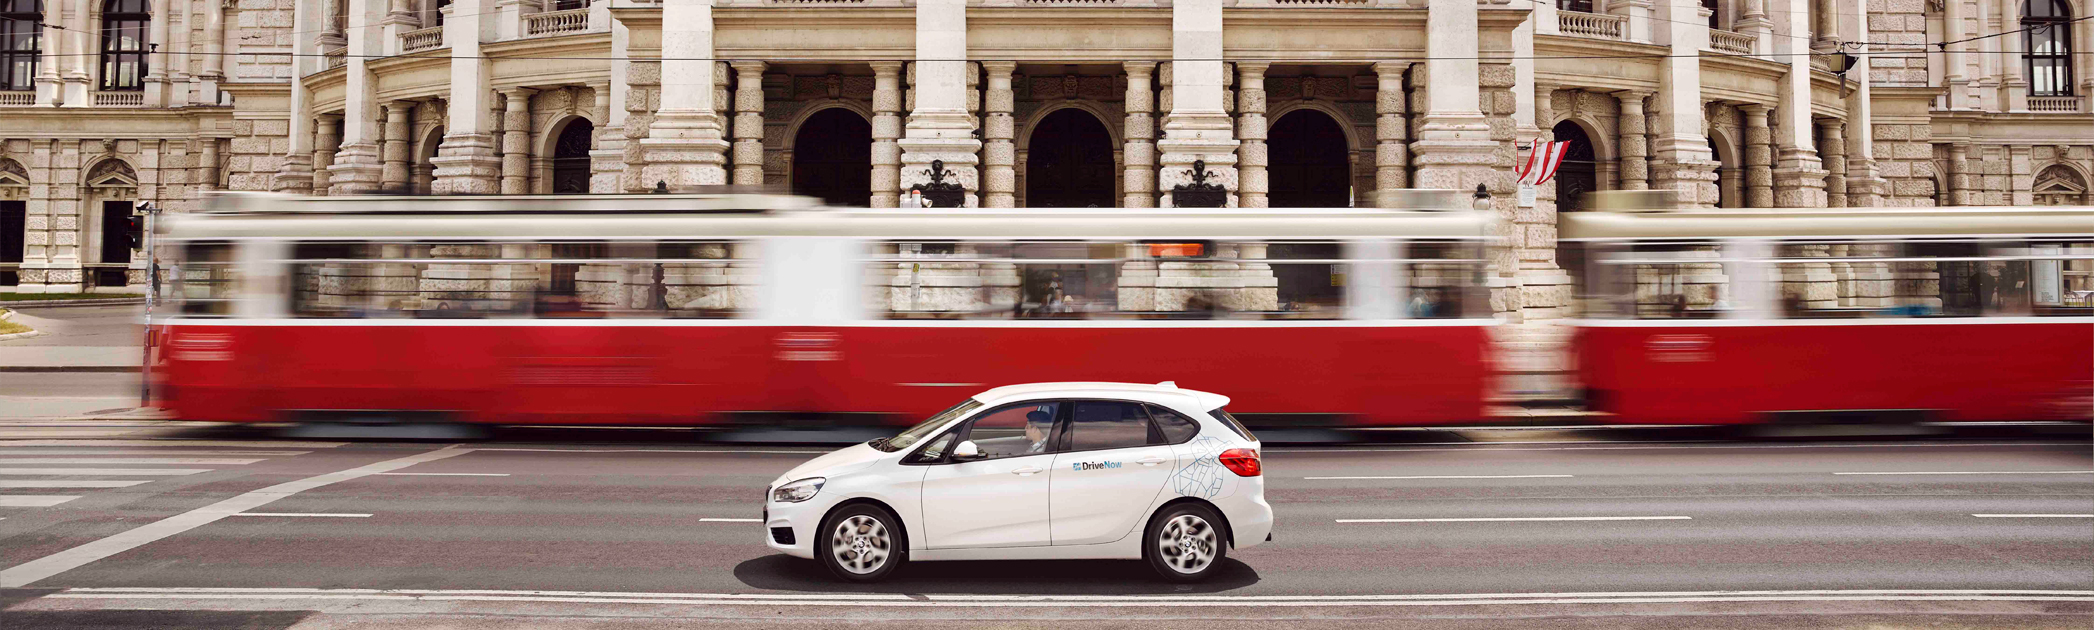 BMW 2er Active Tourer vor dem Wiener Burgtheater